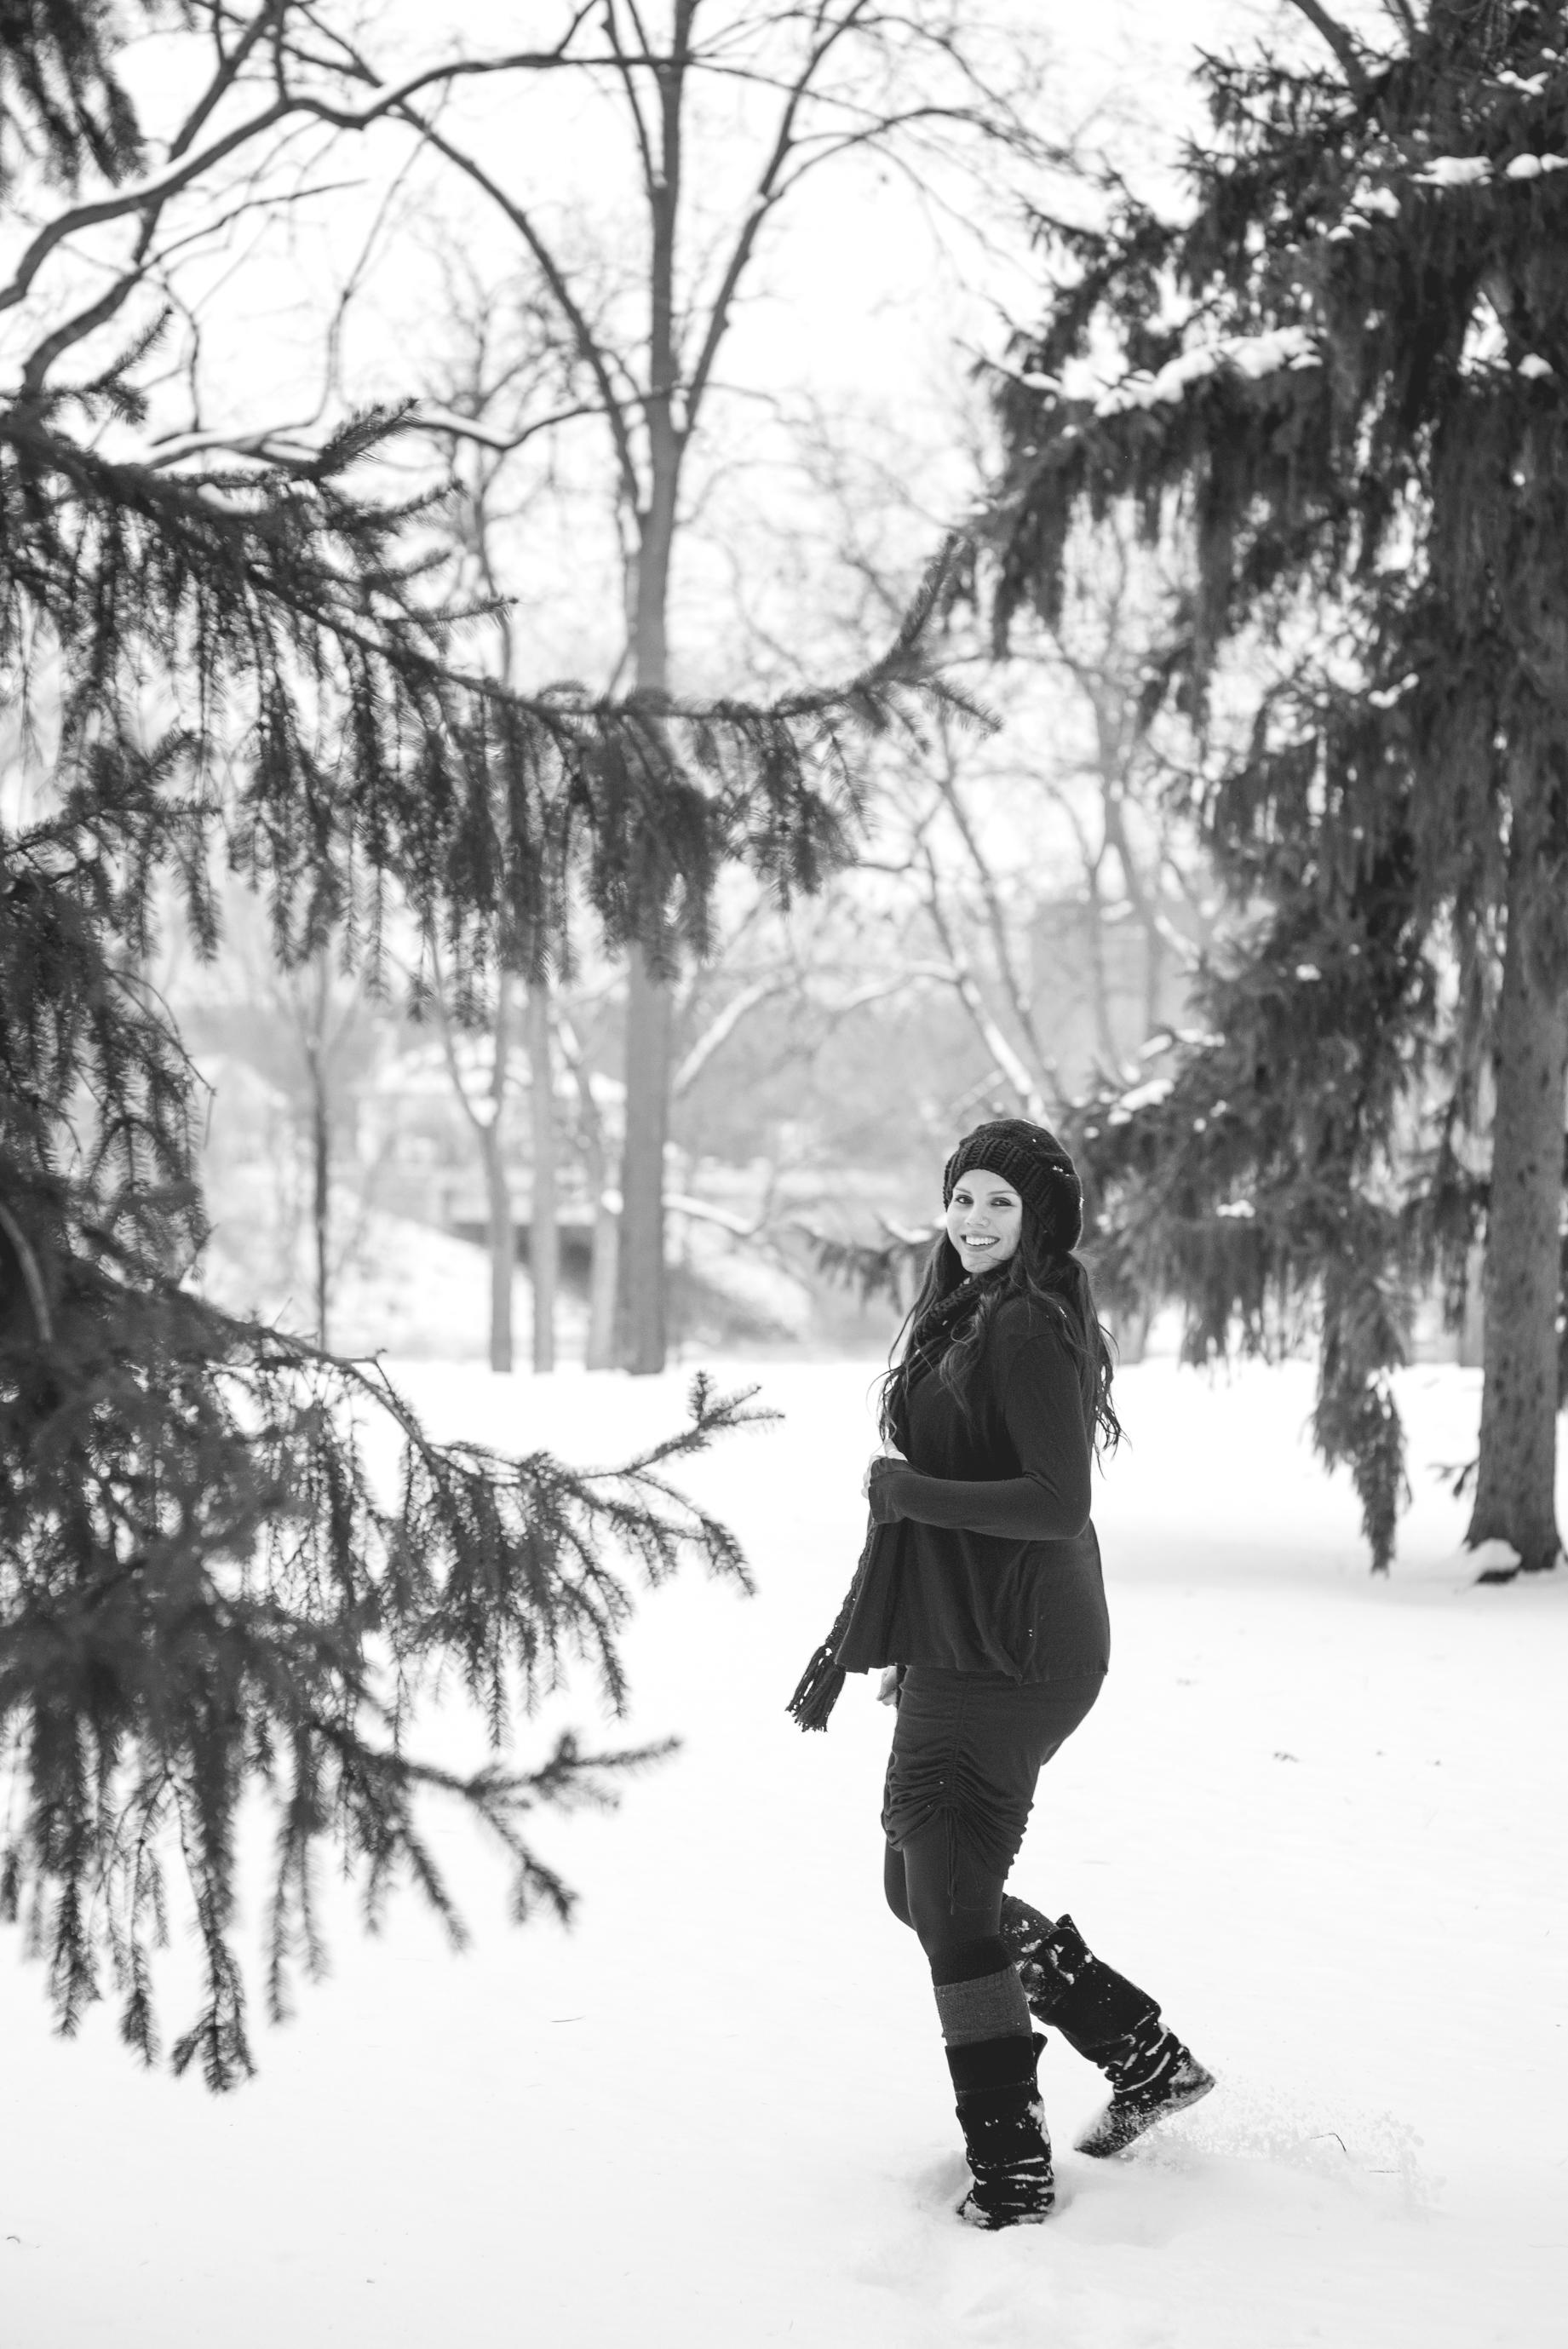 LexiXDphoto